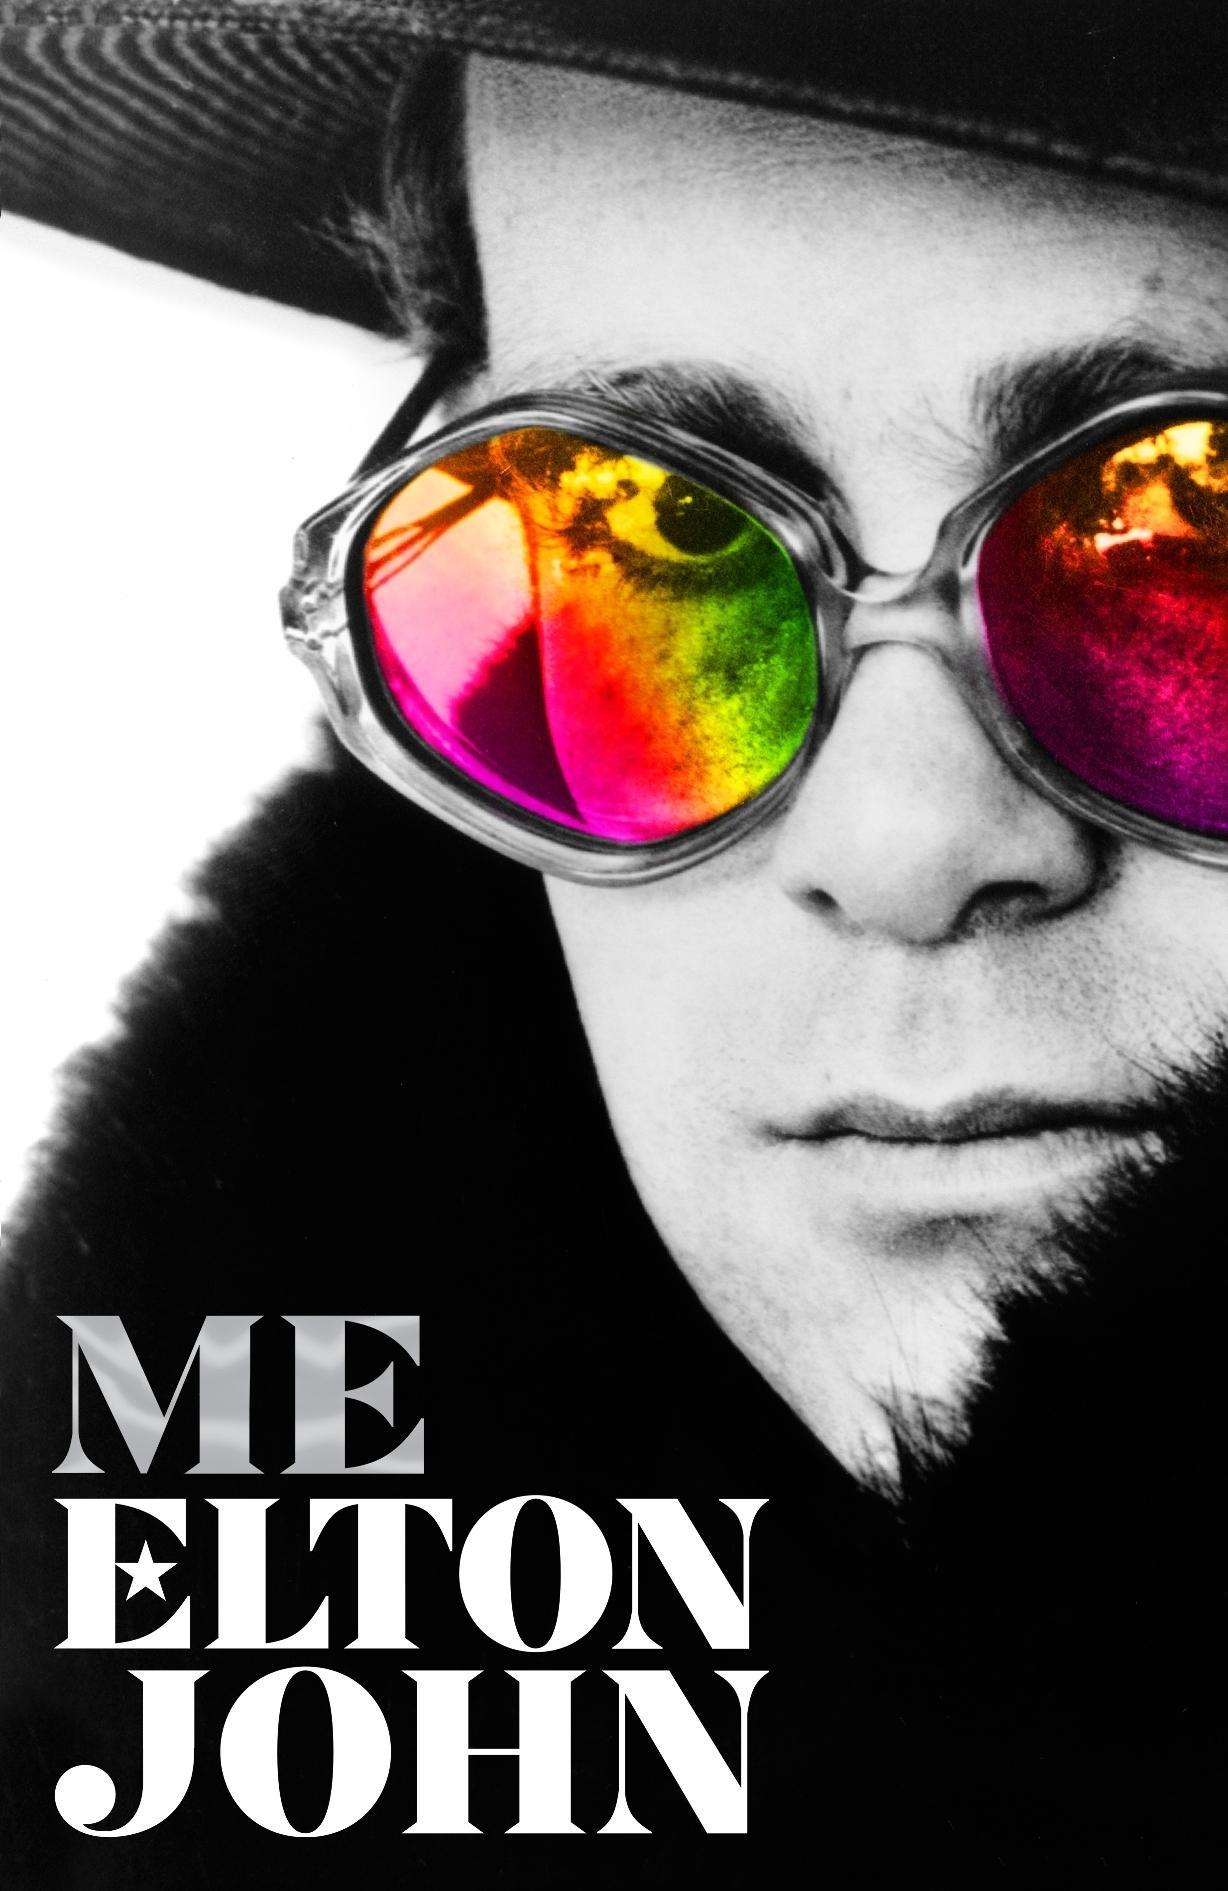 Me:EltonJohn